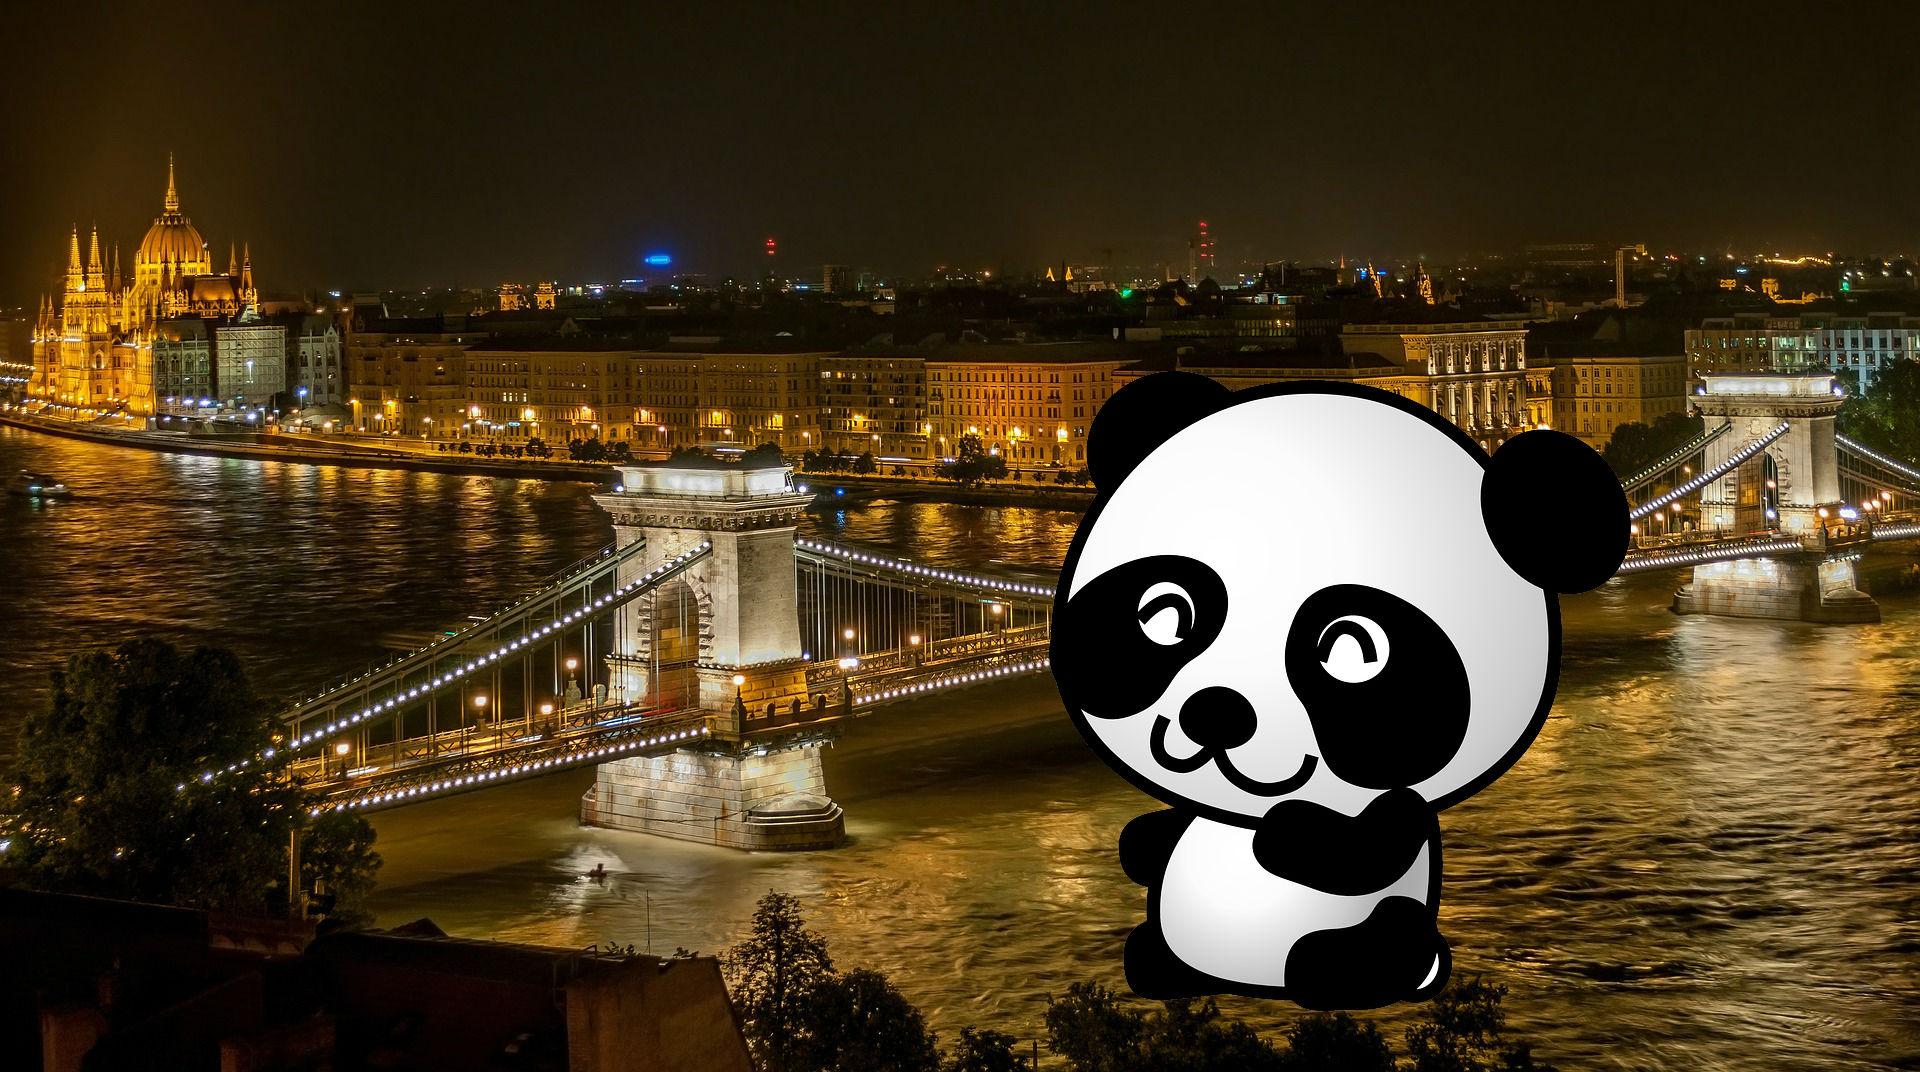 budapest-panda-boss.jpg